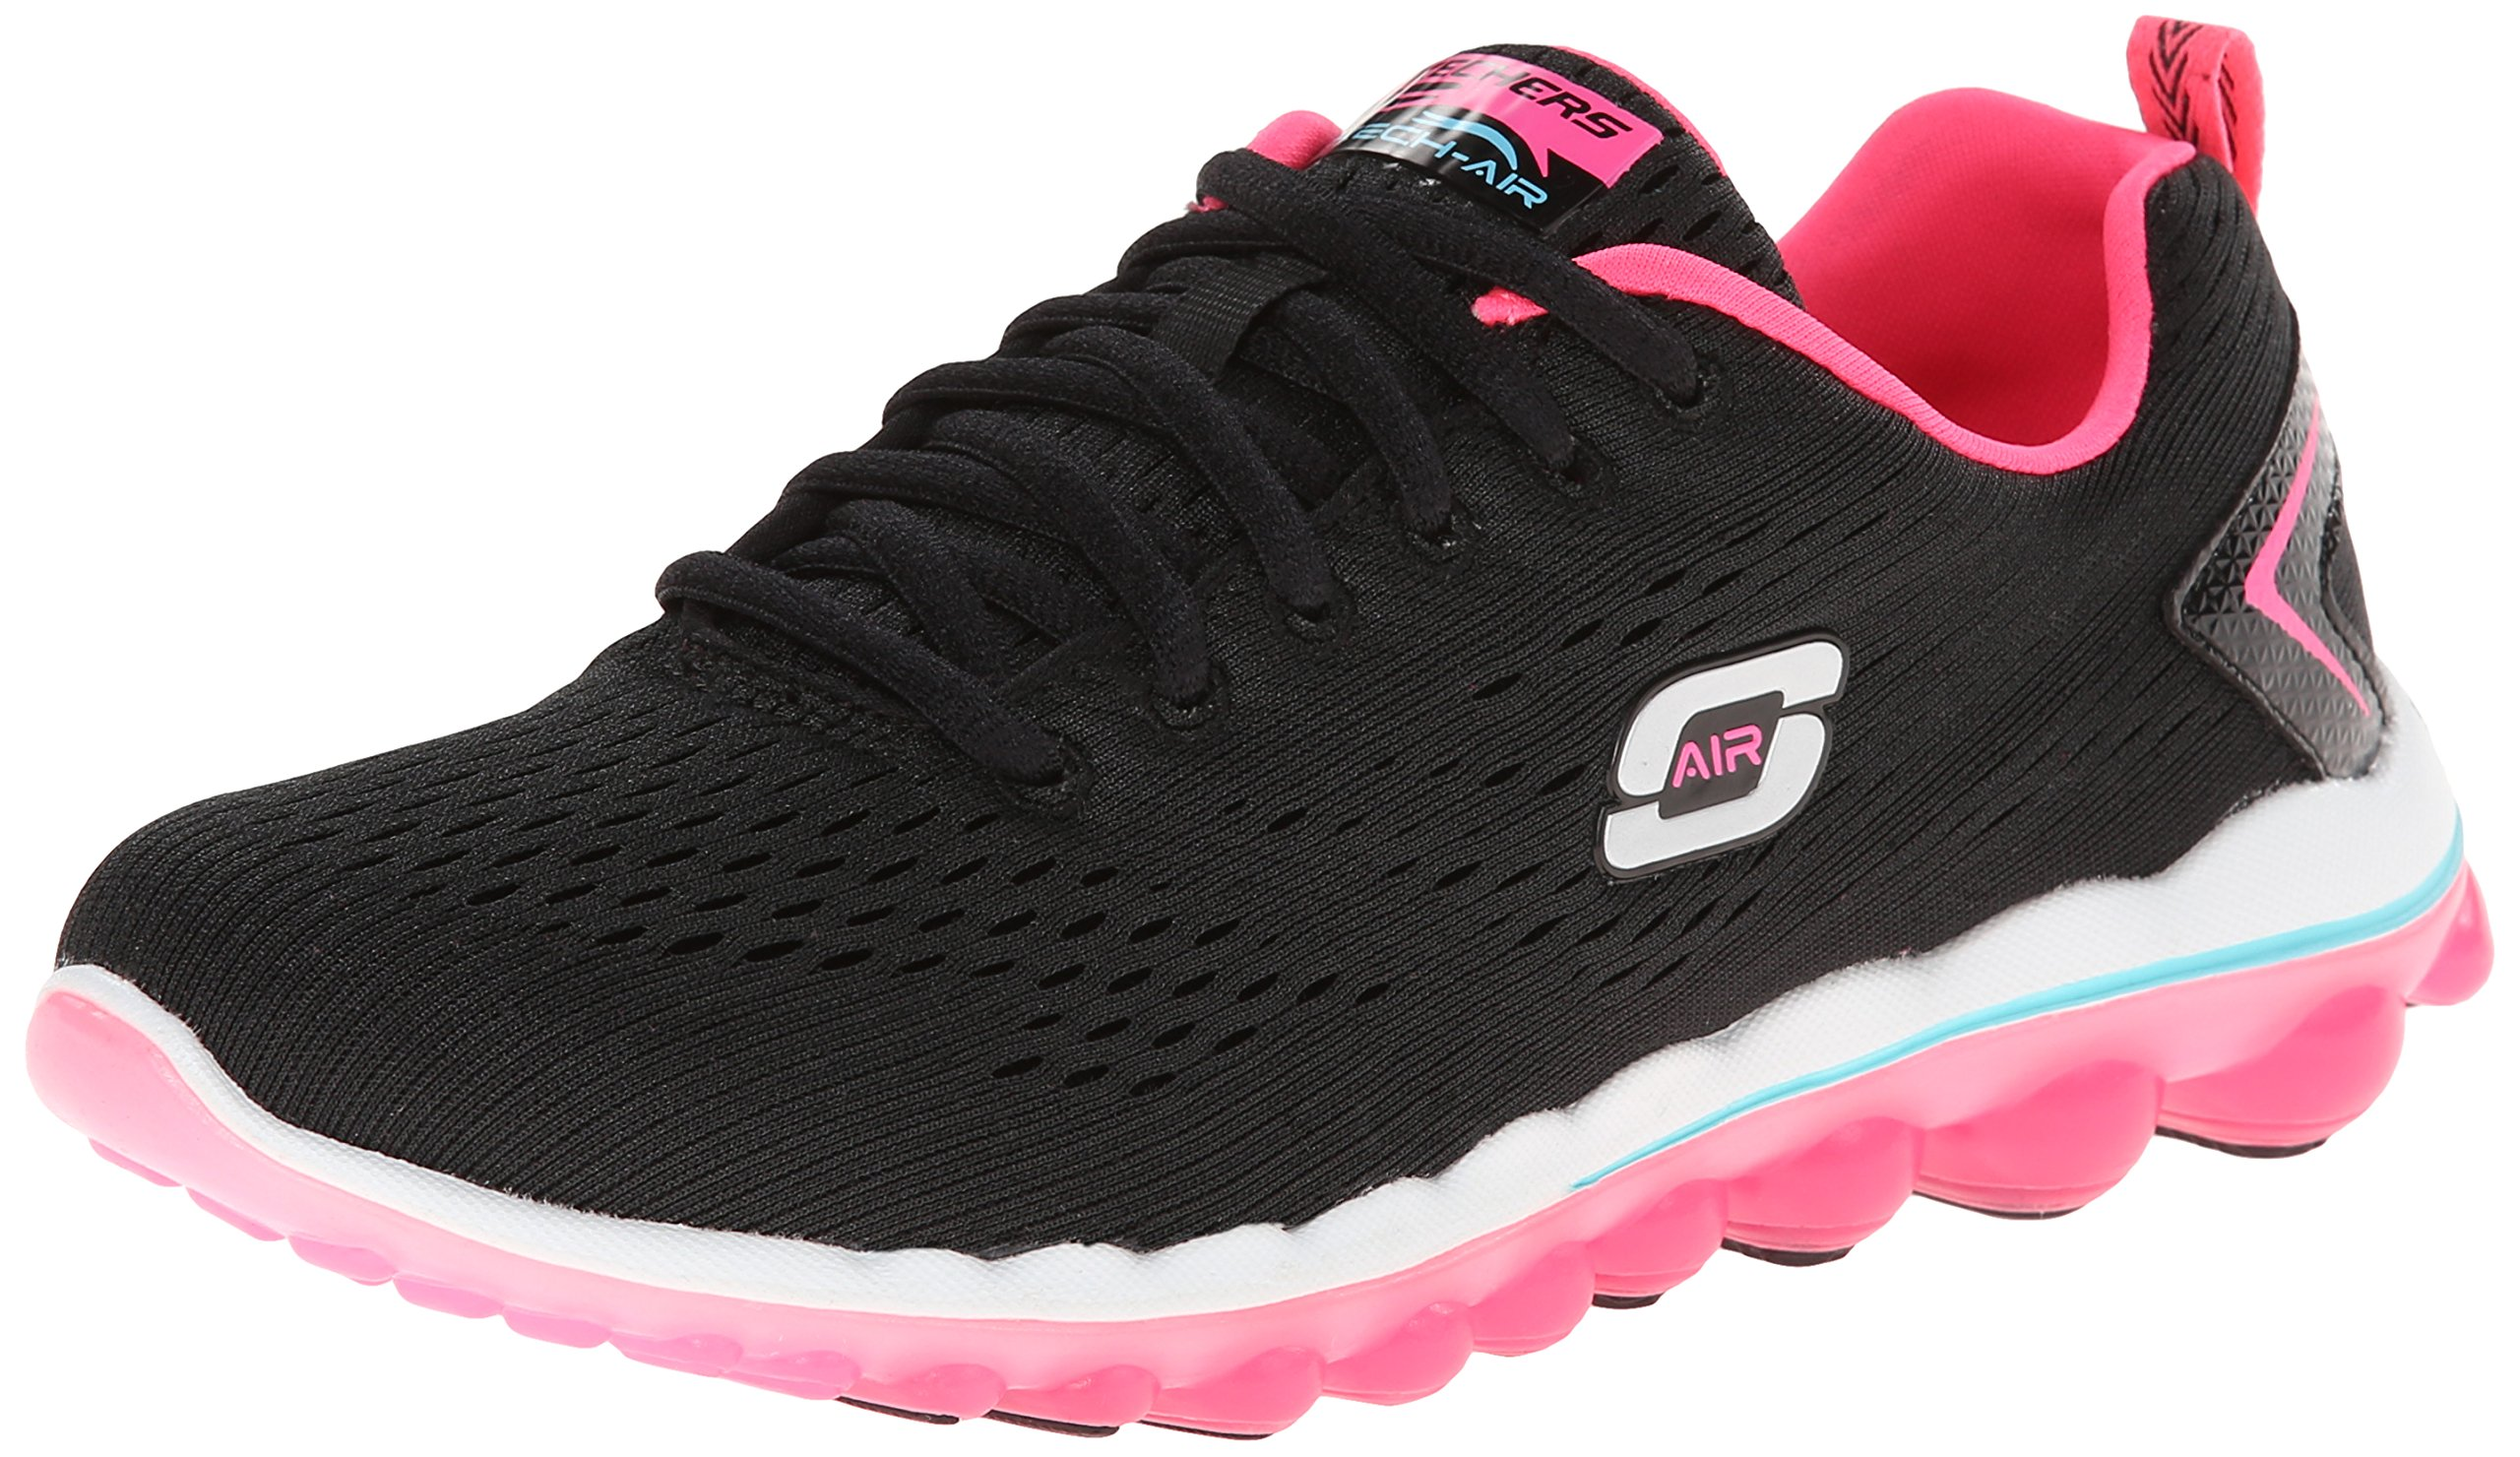 Skechers Sport Women's Skech Air Aim High Fashion Sneaker,Black Mesh/Hot Pink Trim,9 M US